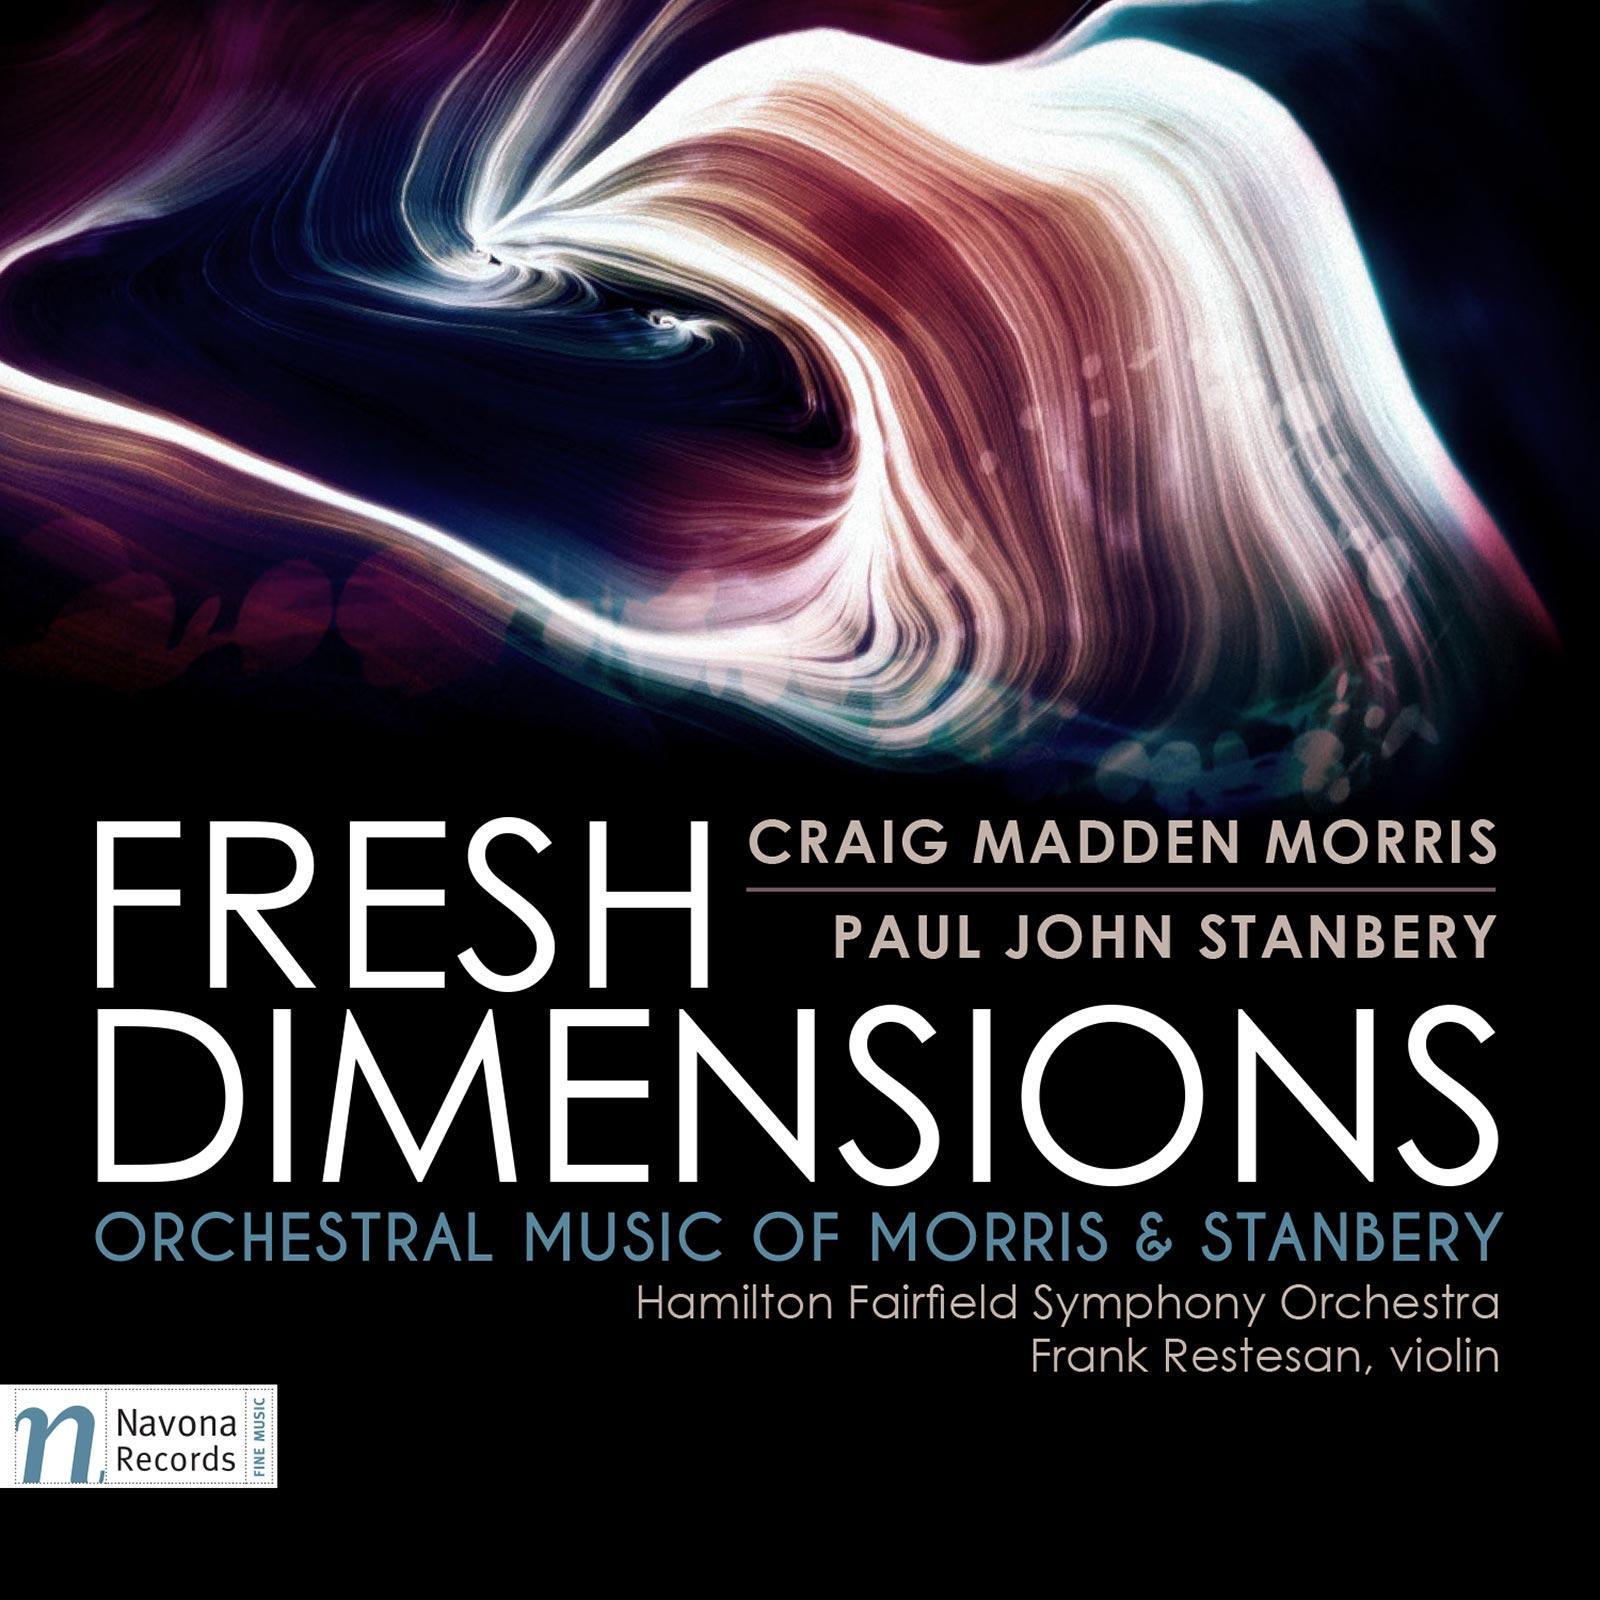 FRESH DIMENSIONS - album cover